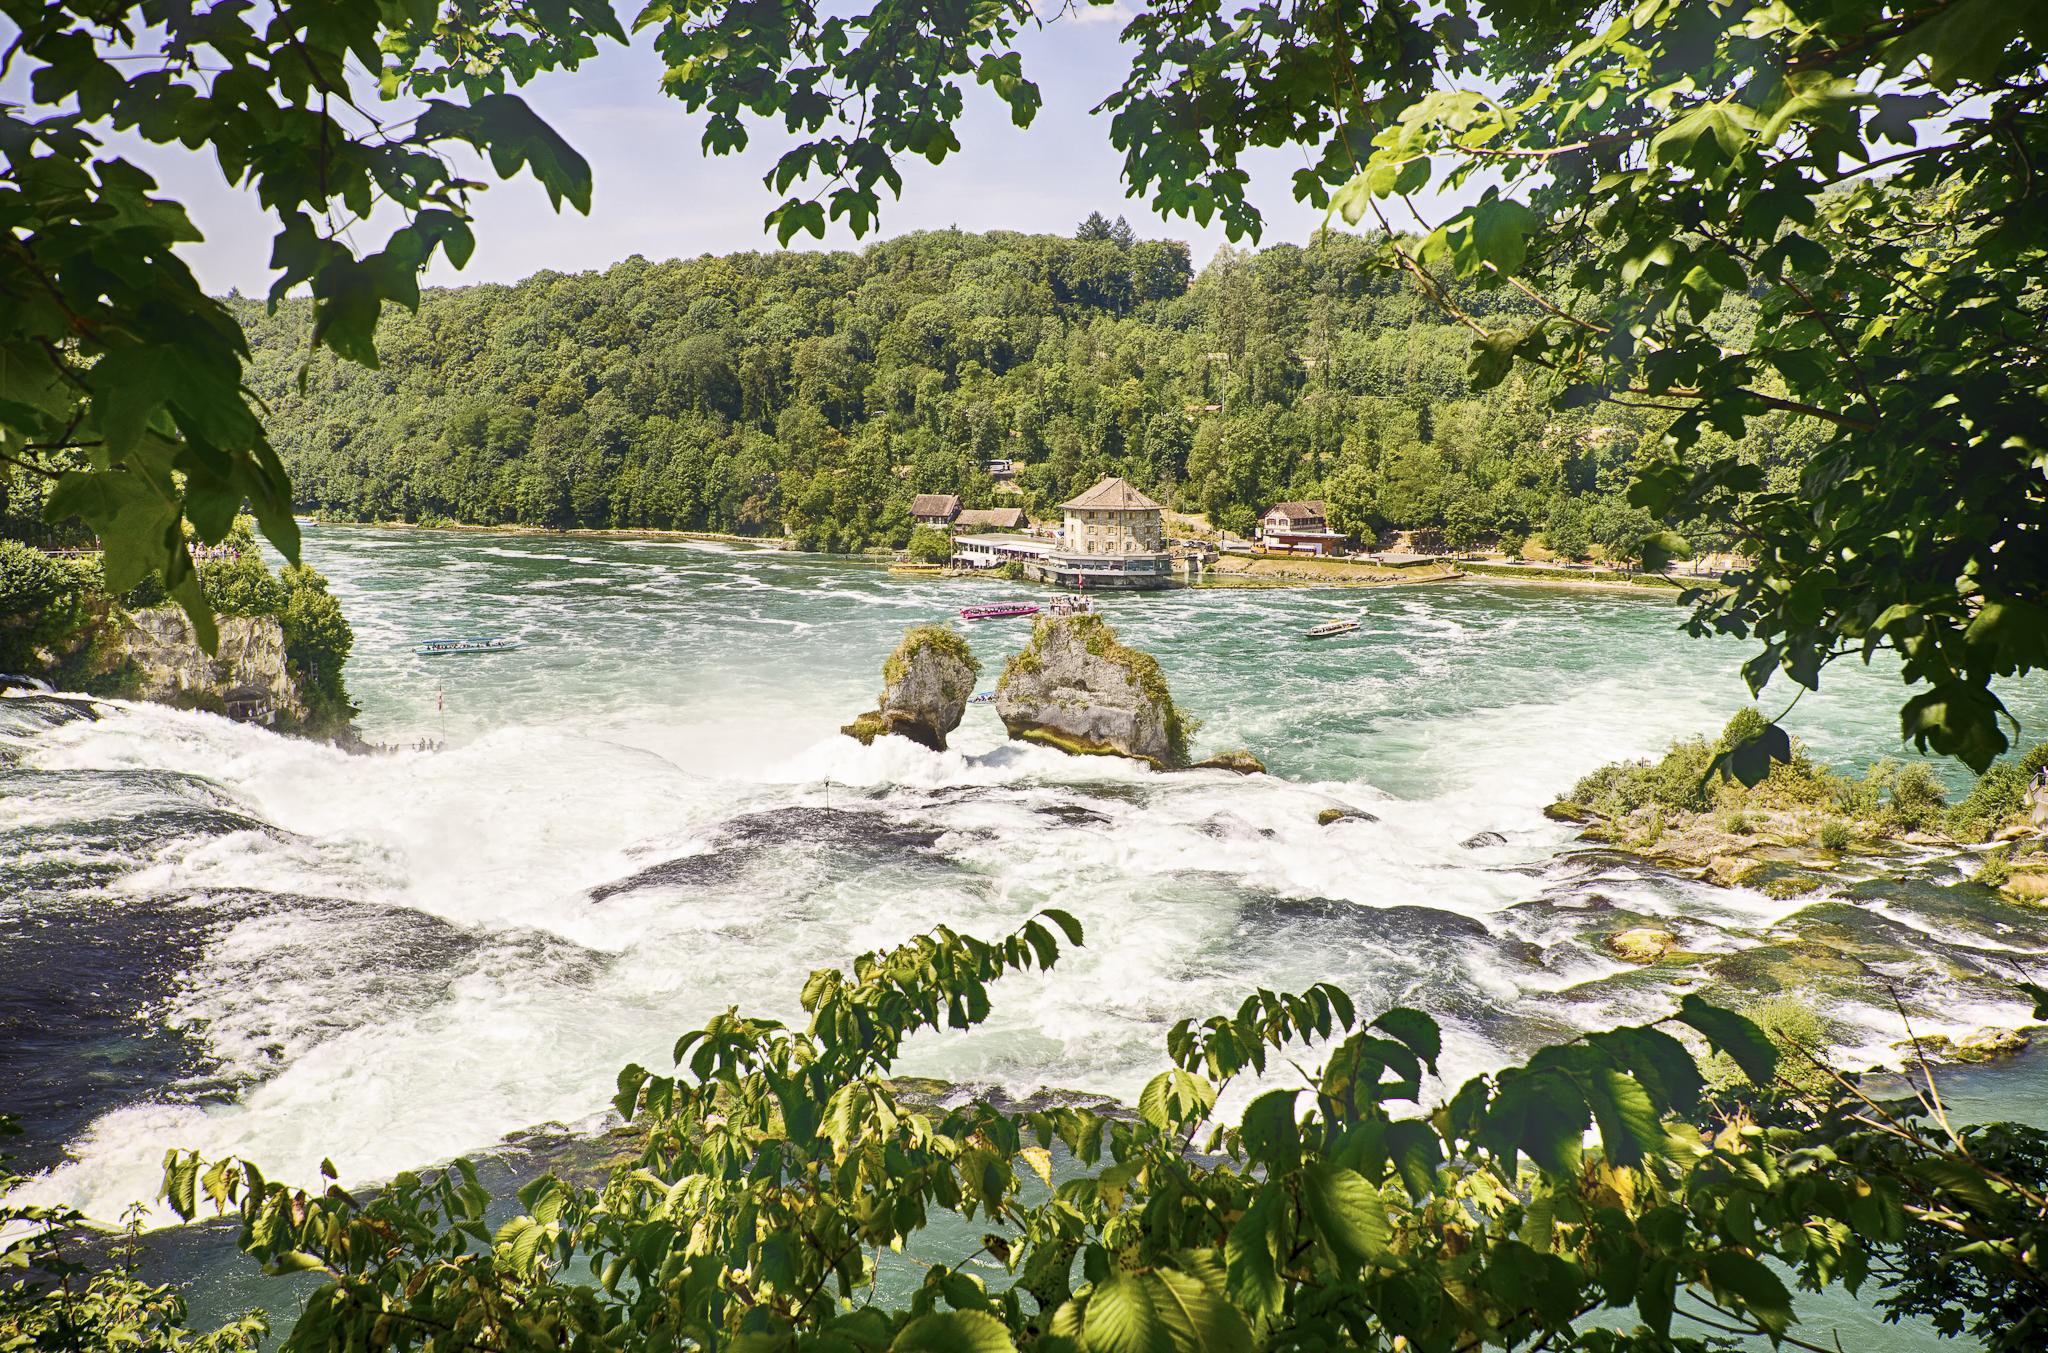 Rheinfall III, Switzerland